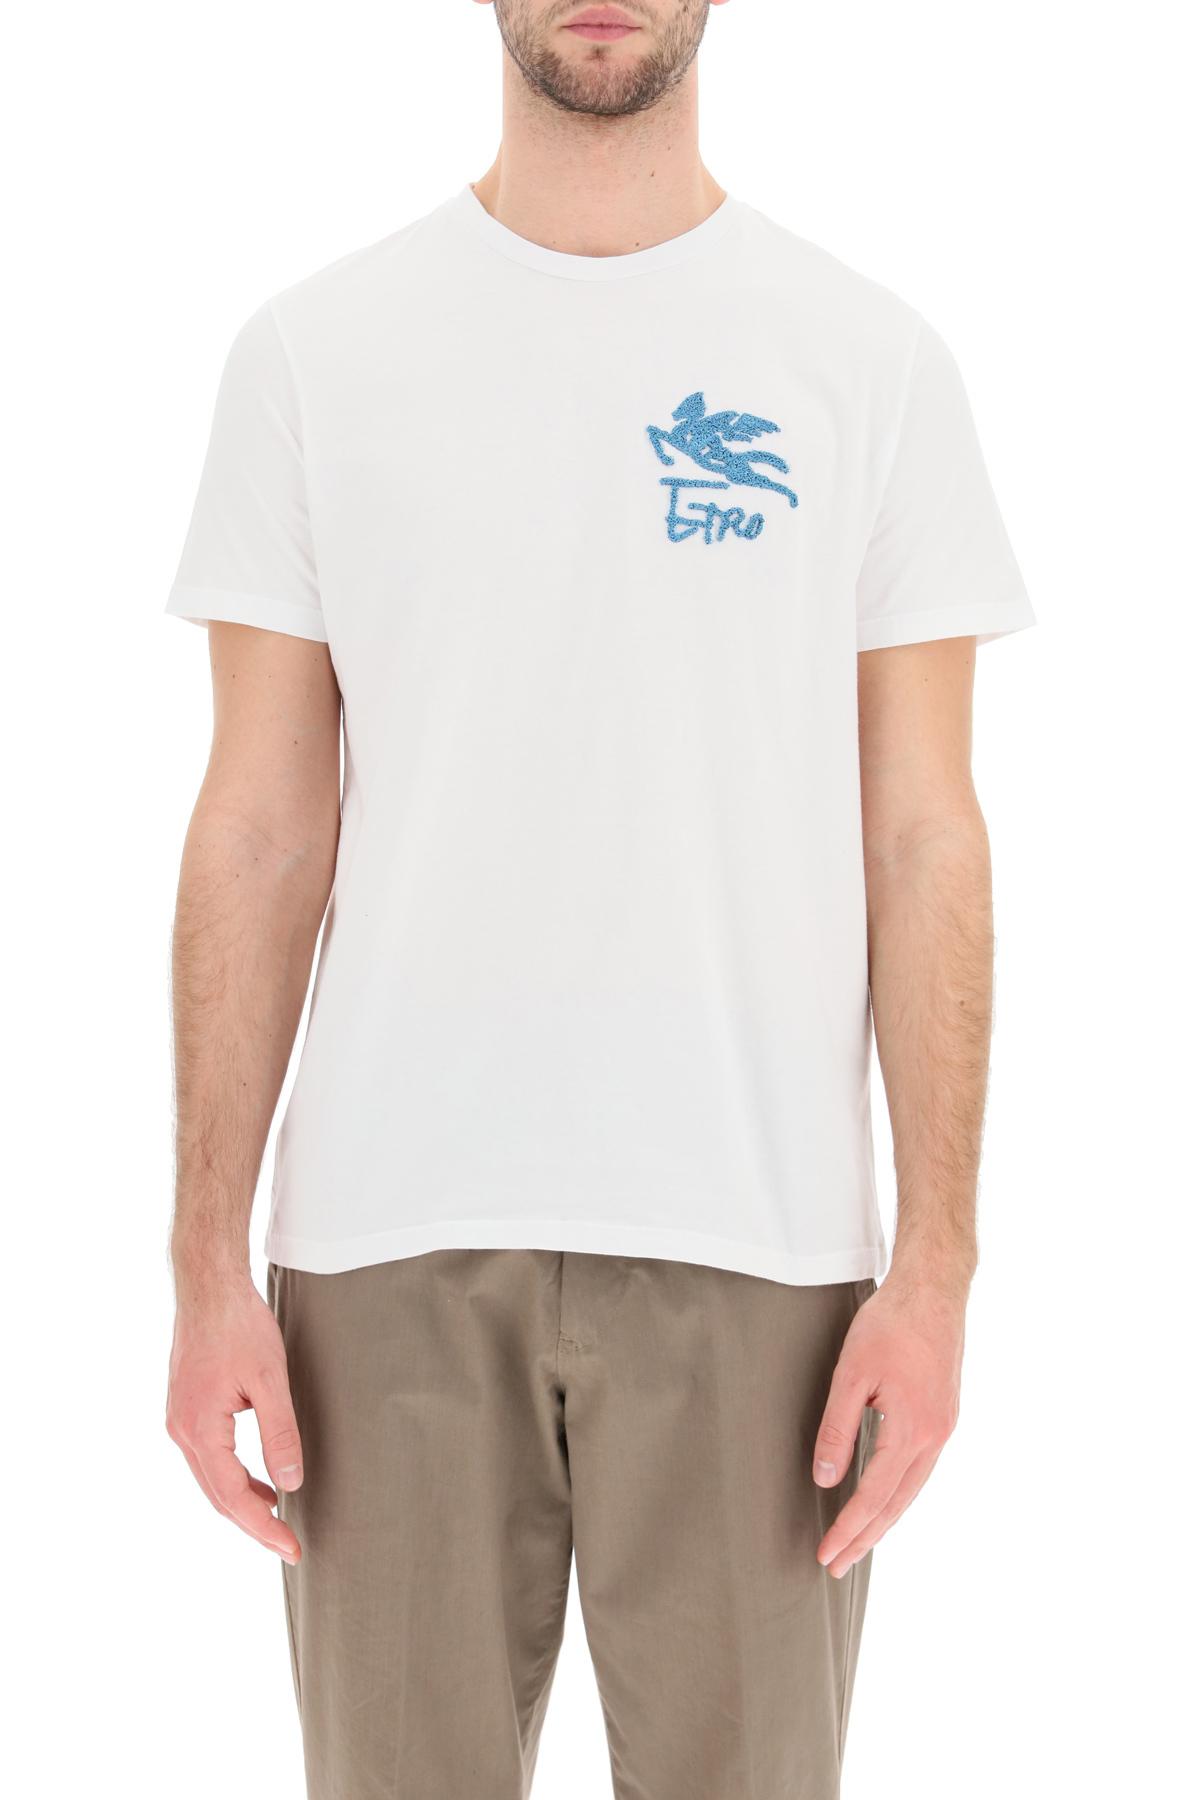 Etro t-shirt ricamo pegaso